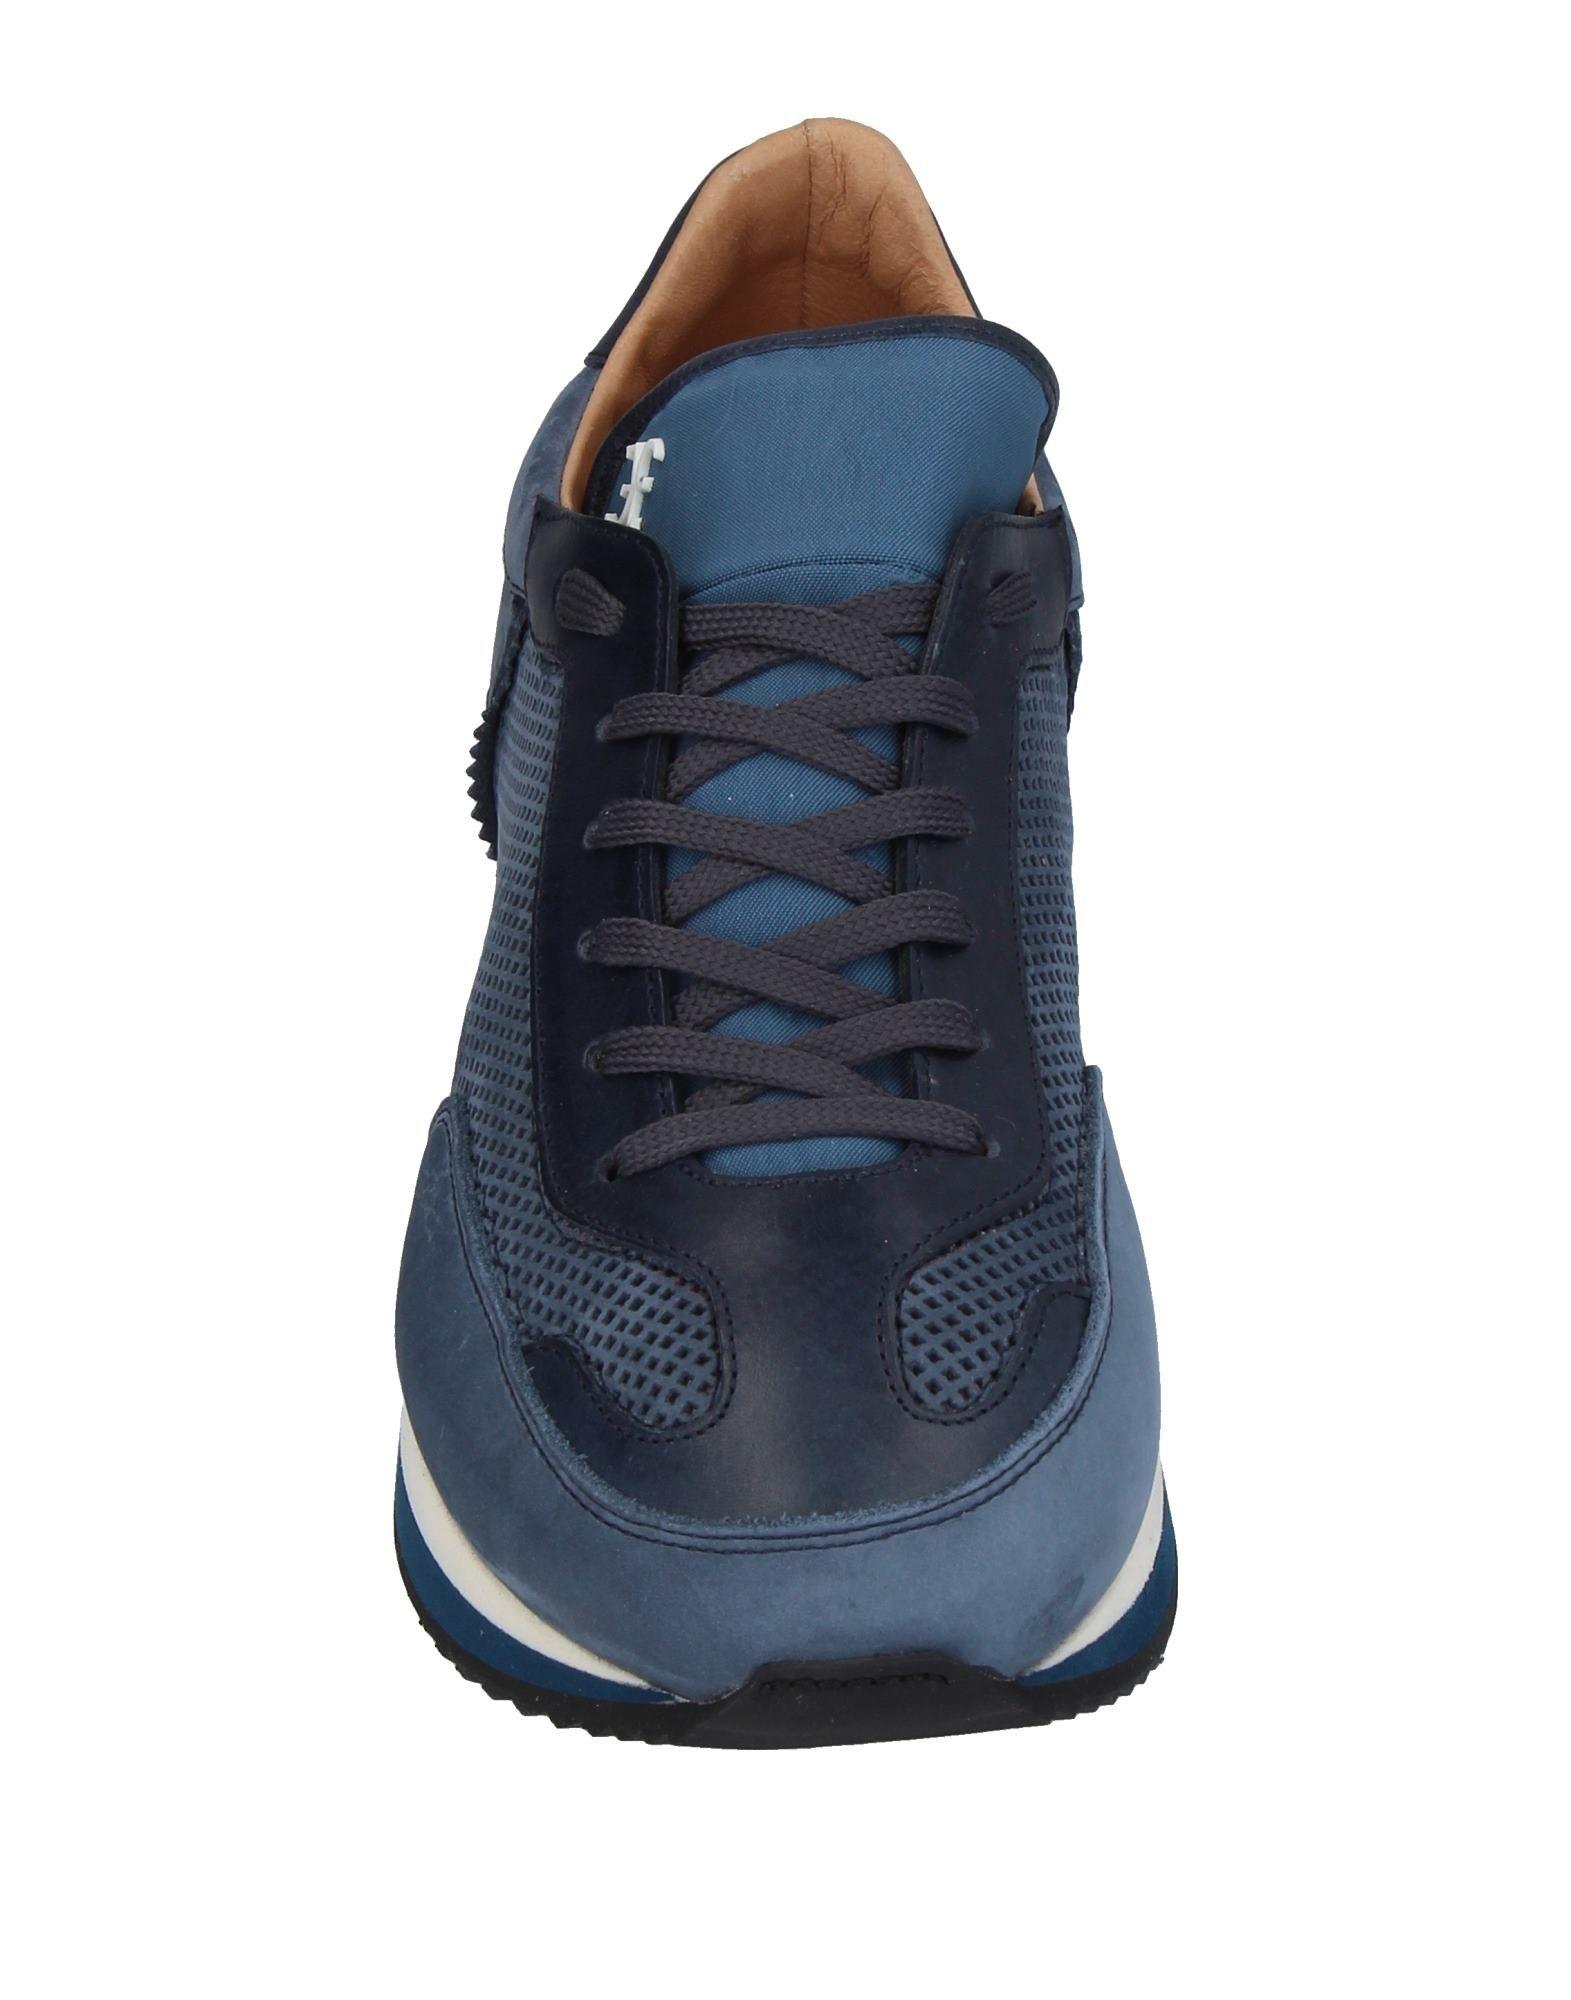 Fabi Sneakers Herren  11415886LV   11415886LV 5aebc4